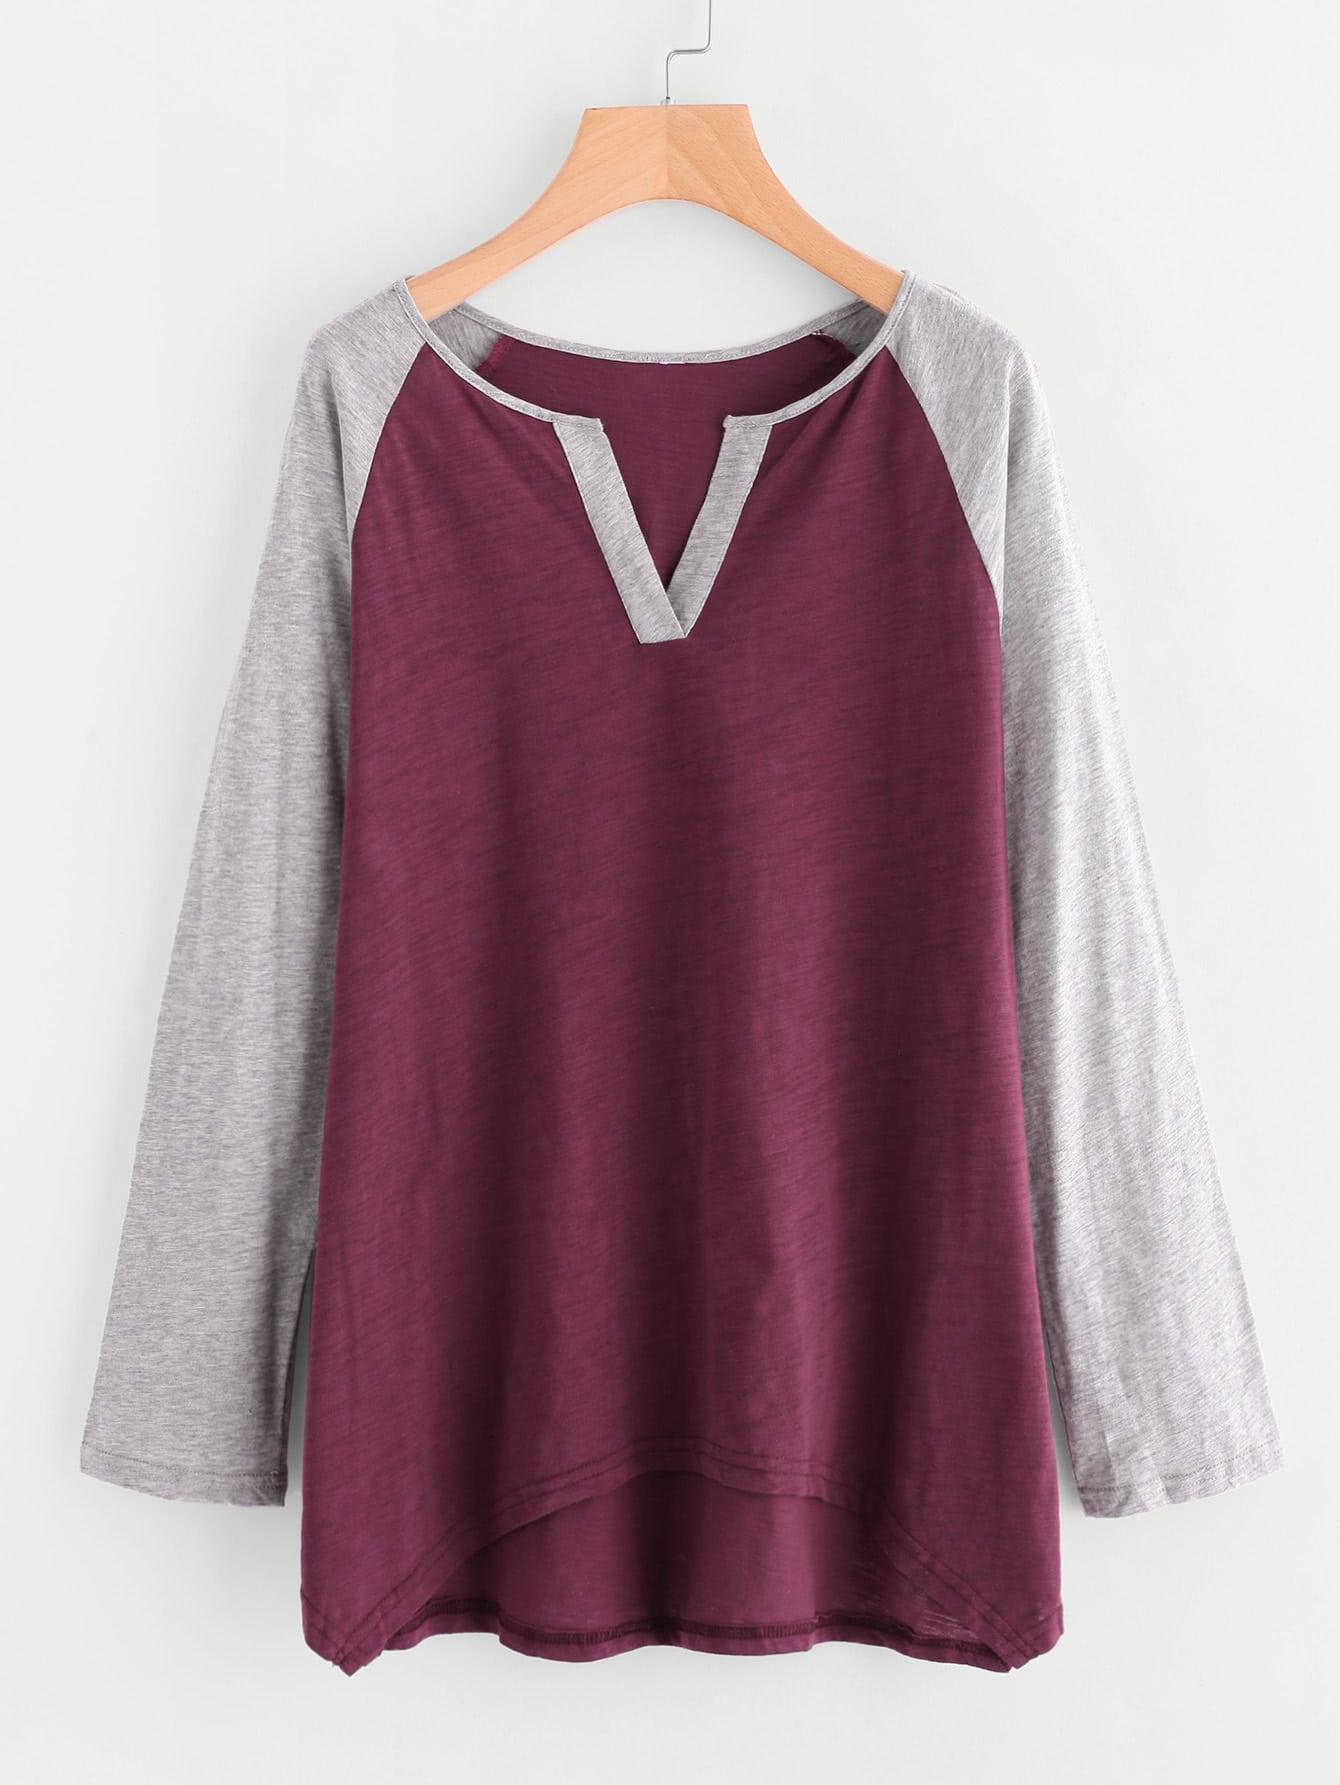 Contrast V Notch And Raglan Sleeve Slub T-shirt